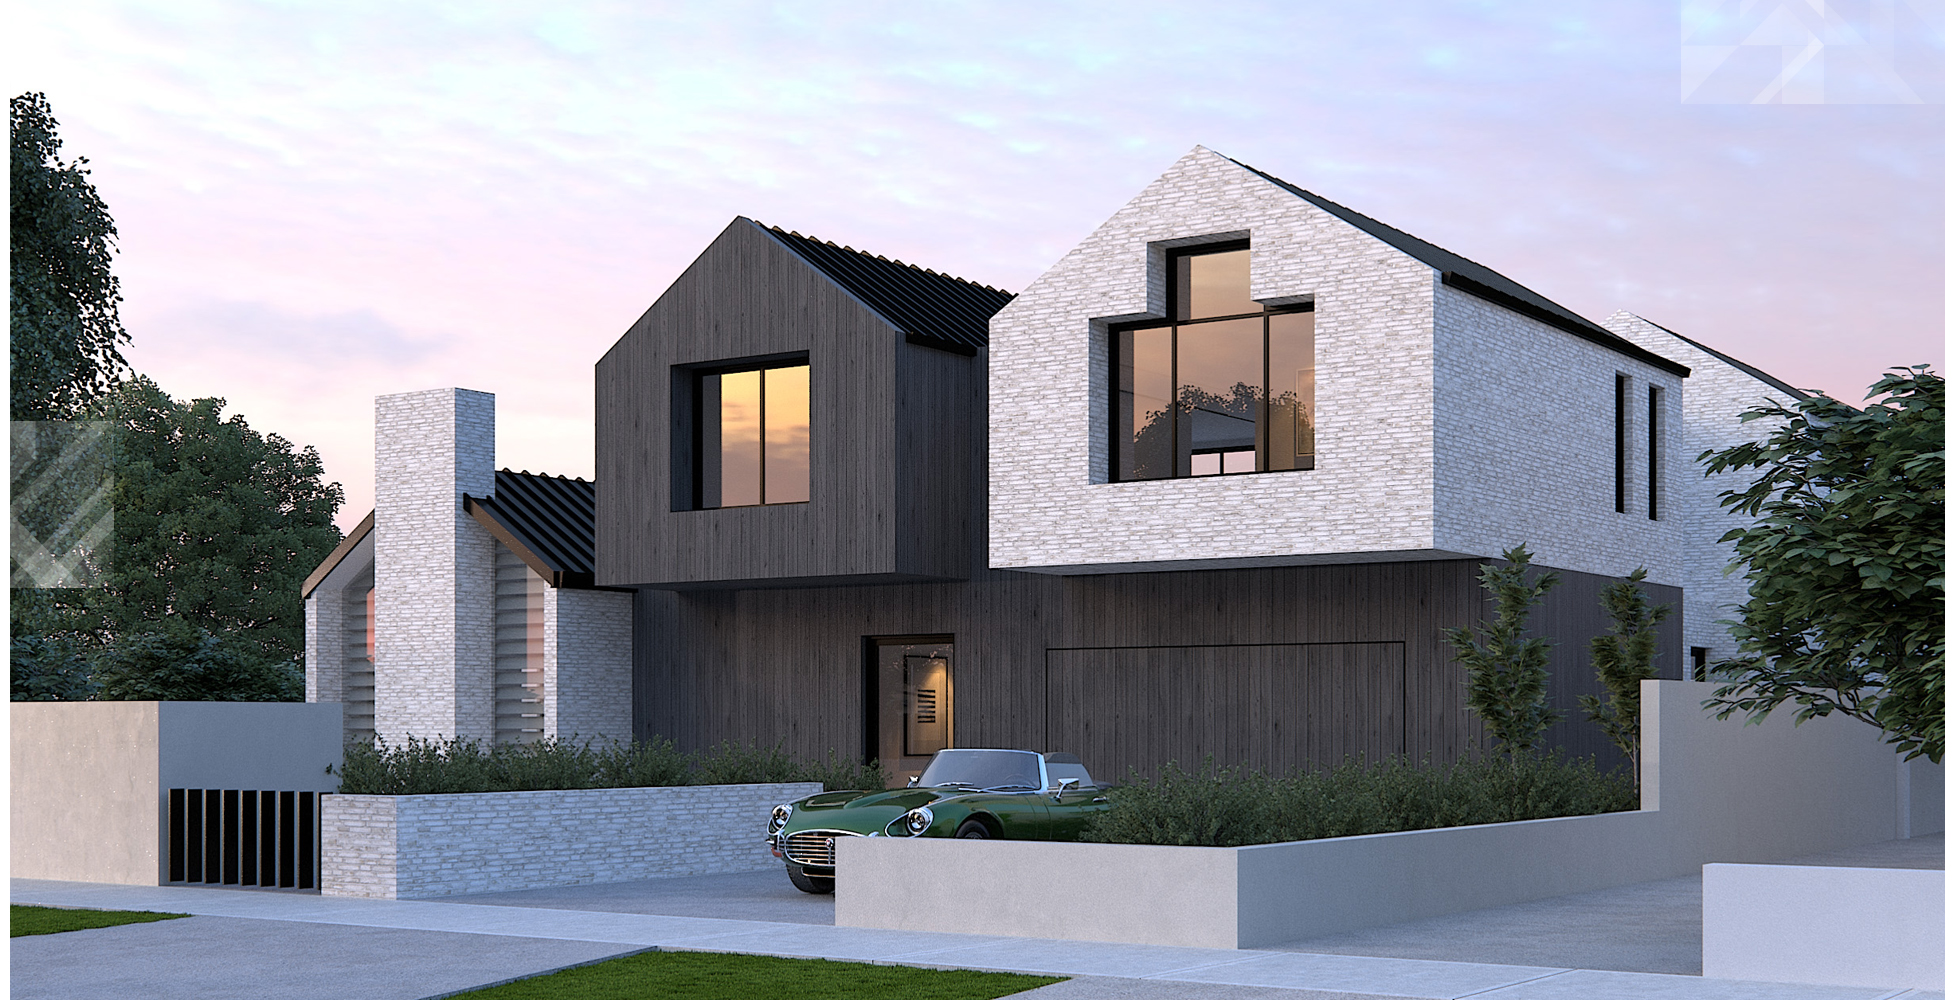 maek-custom-home-build-process-designs-in-development-6.jpg